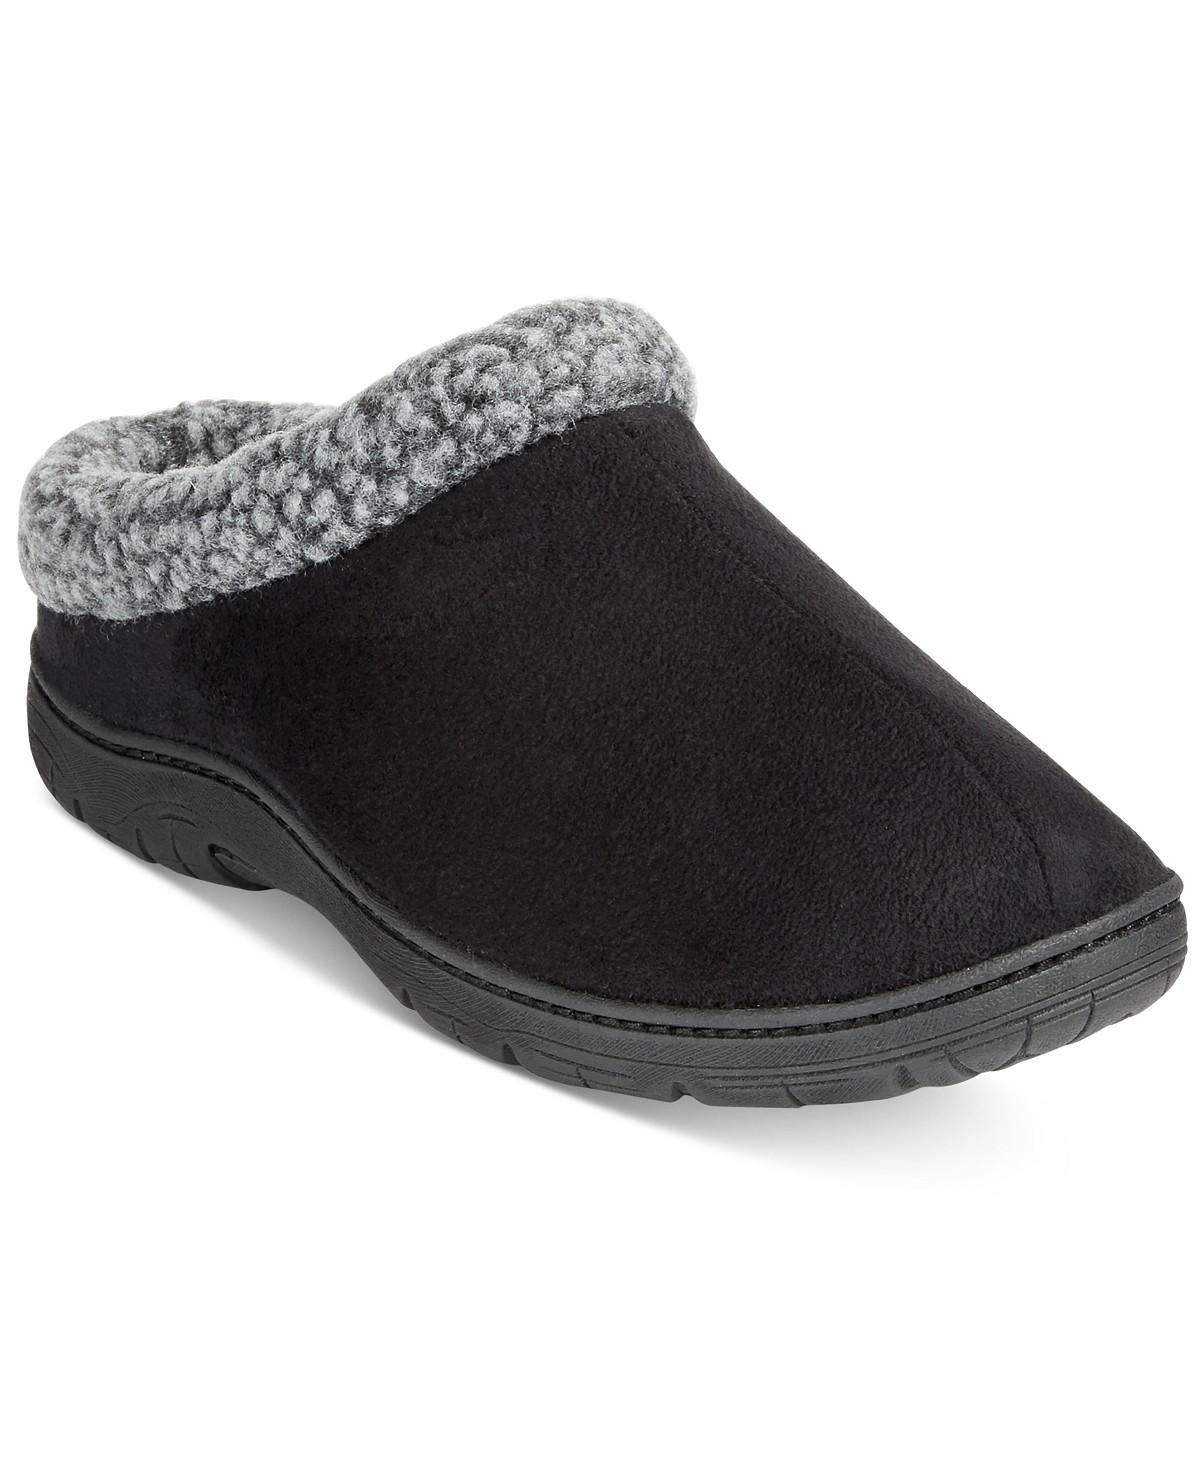 cf535691e2e Macys.com  32 Degrees Men s Faux Suede   Memory Foam Roll-Collar Clog  Slippers Sz. XL -  9.12 with Free Store Pickup